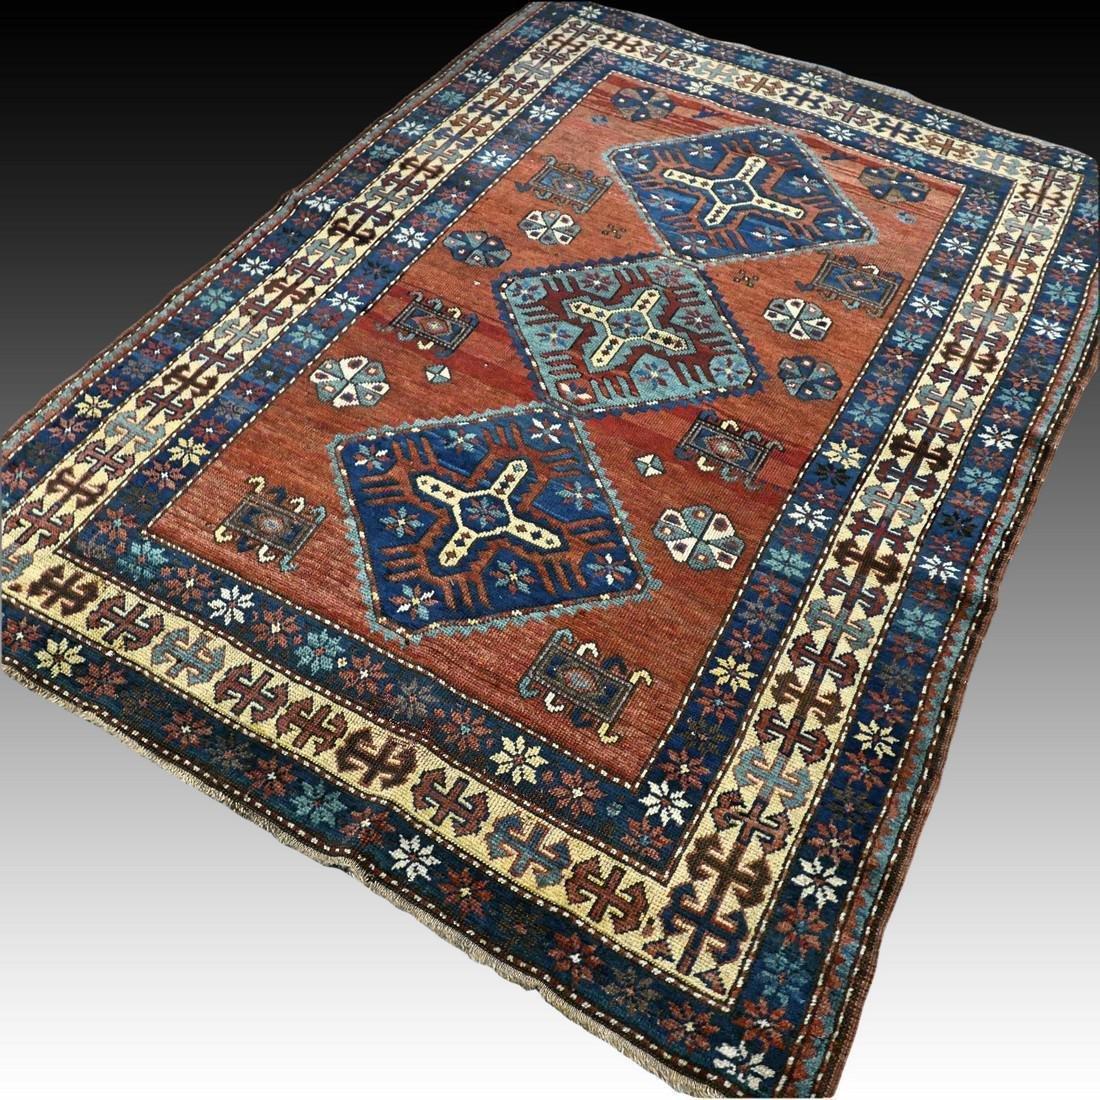 Wonderful antique 1940s Kazak rug6.1 x 4.4